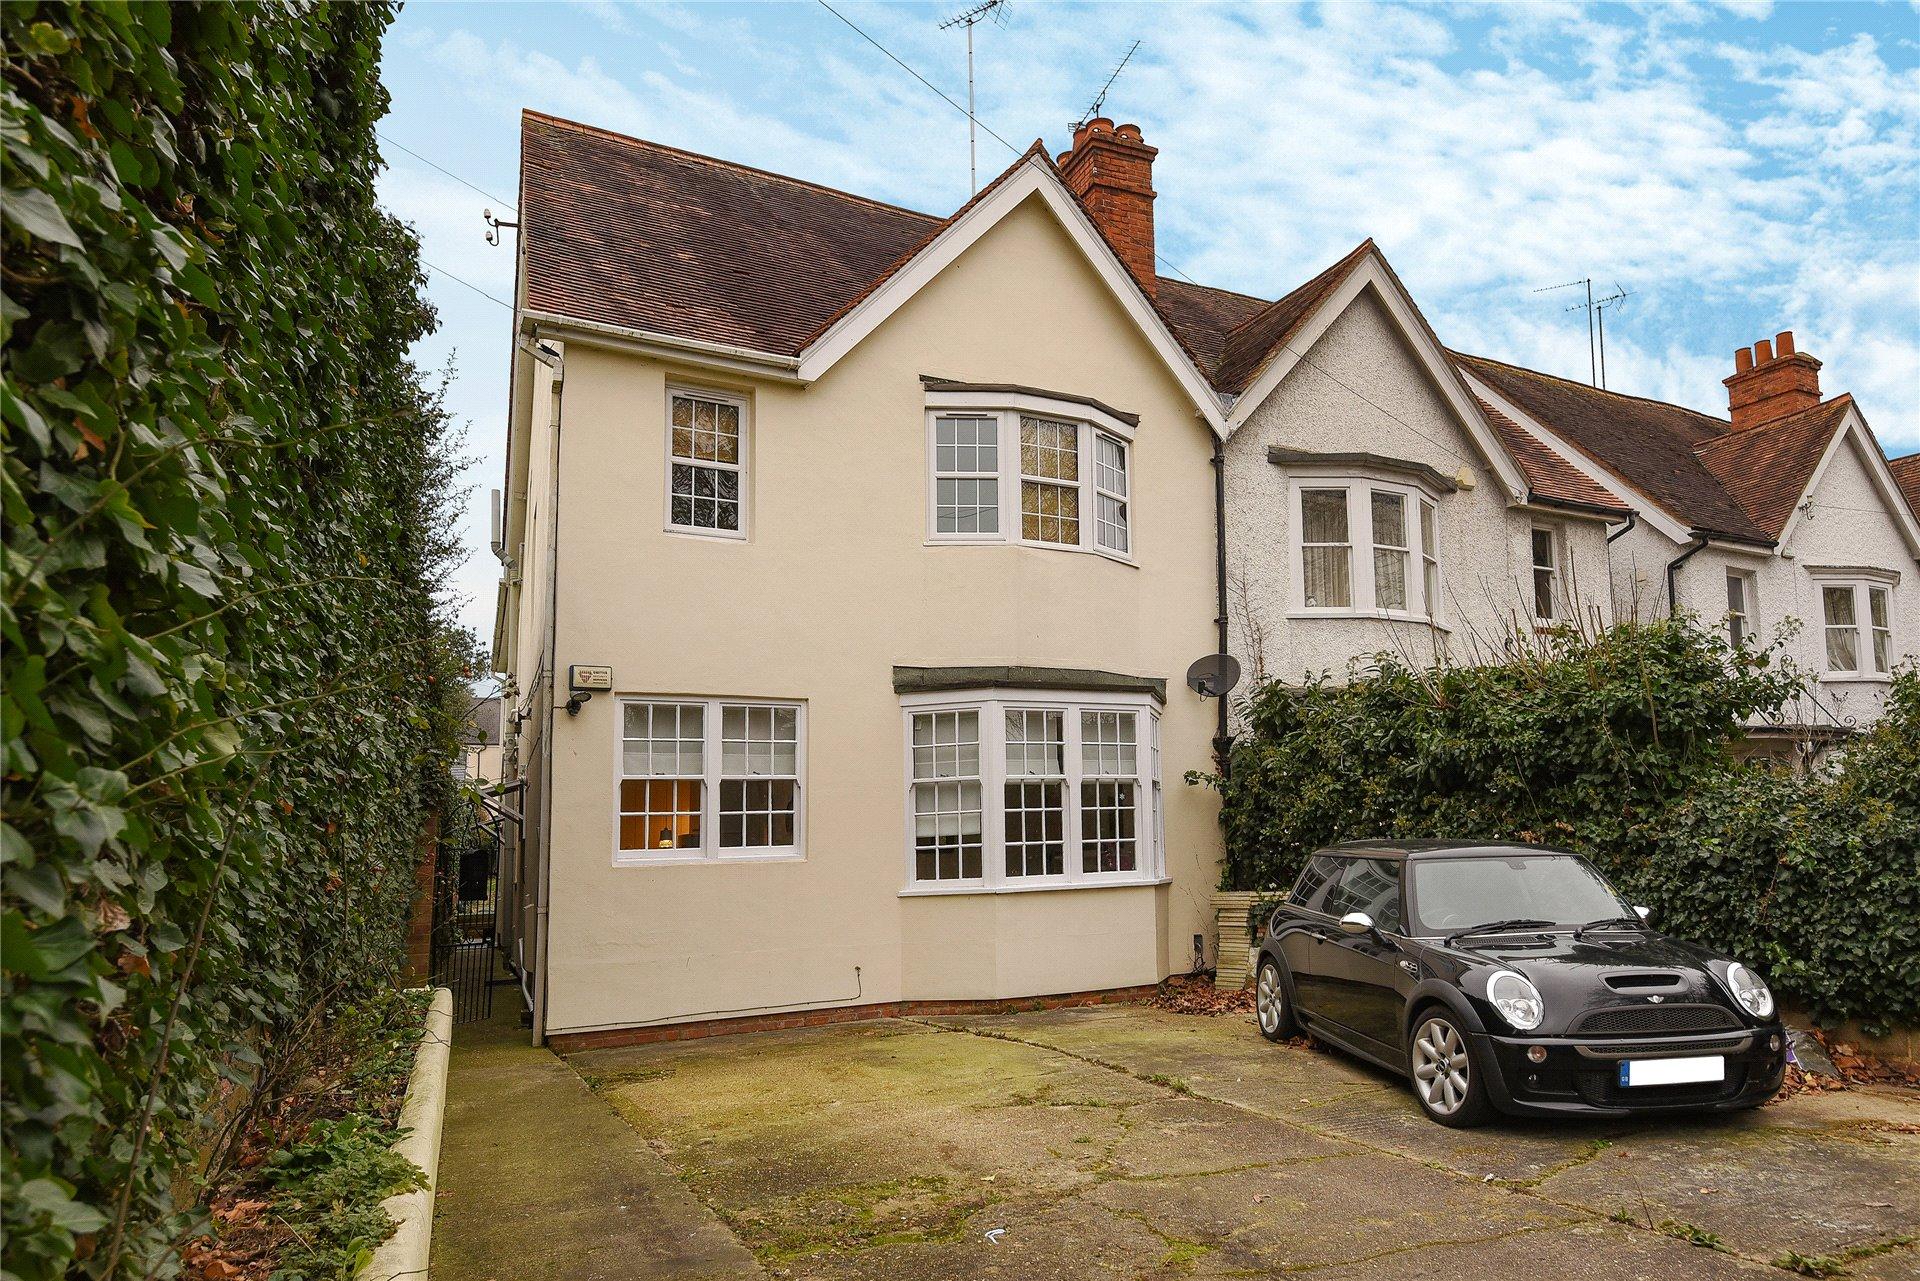 2 Bedrooms Maisonette Flat for sale in Kendrick Road, Reading, Berkshire, RG1